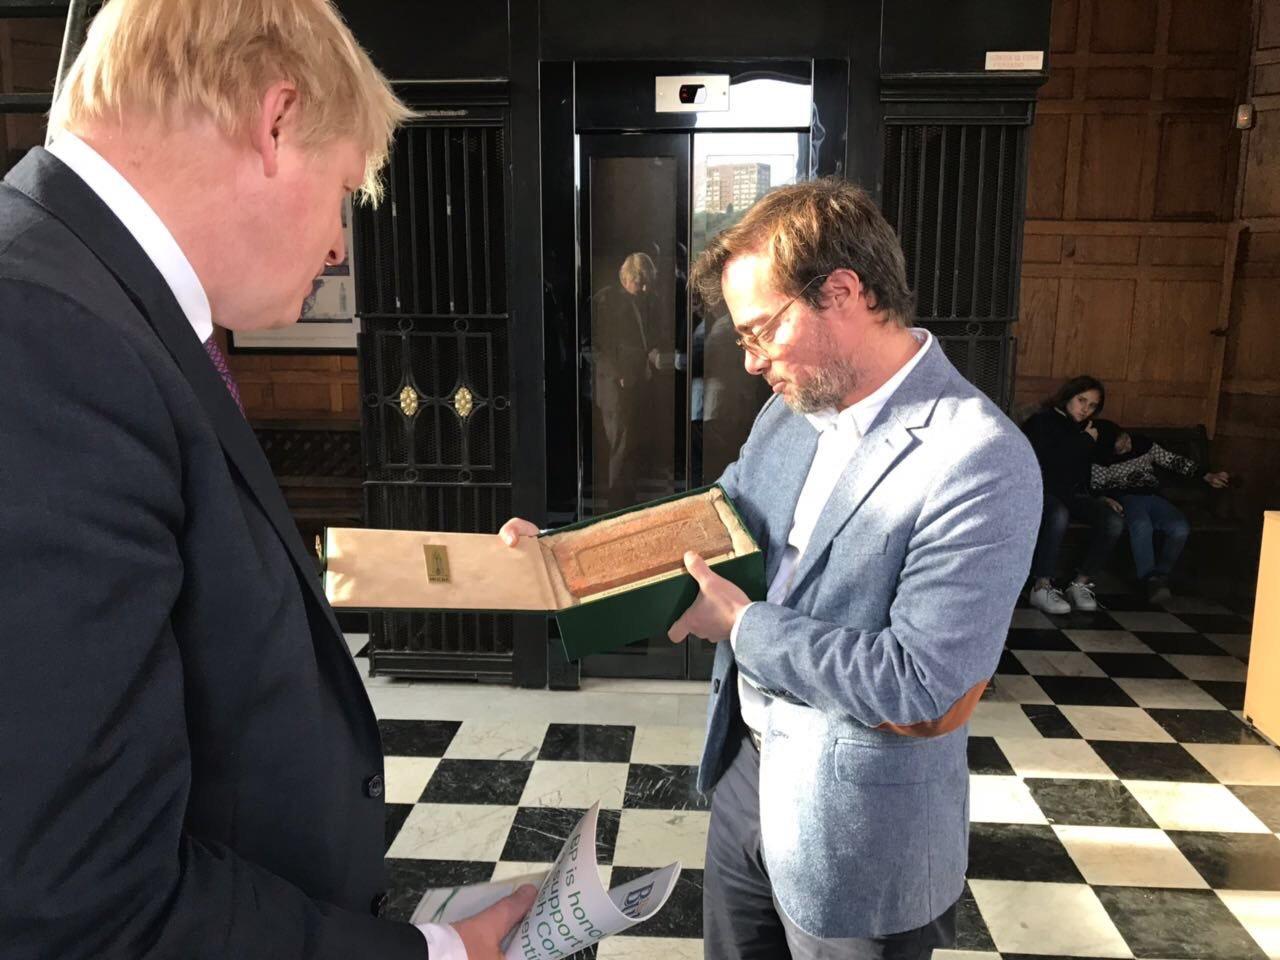 Boris Johnson receives the brick